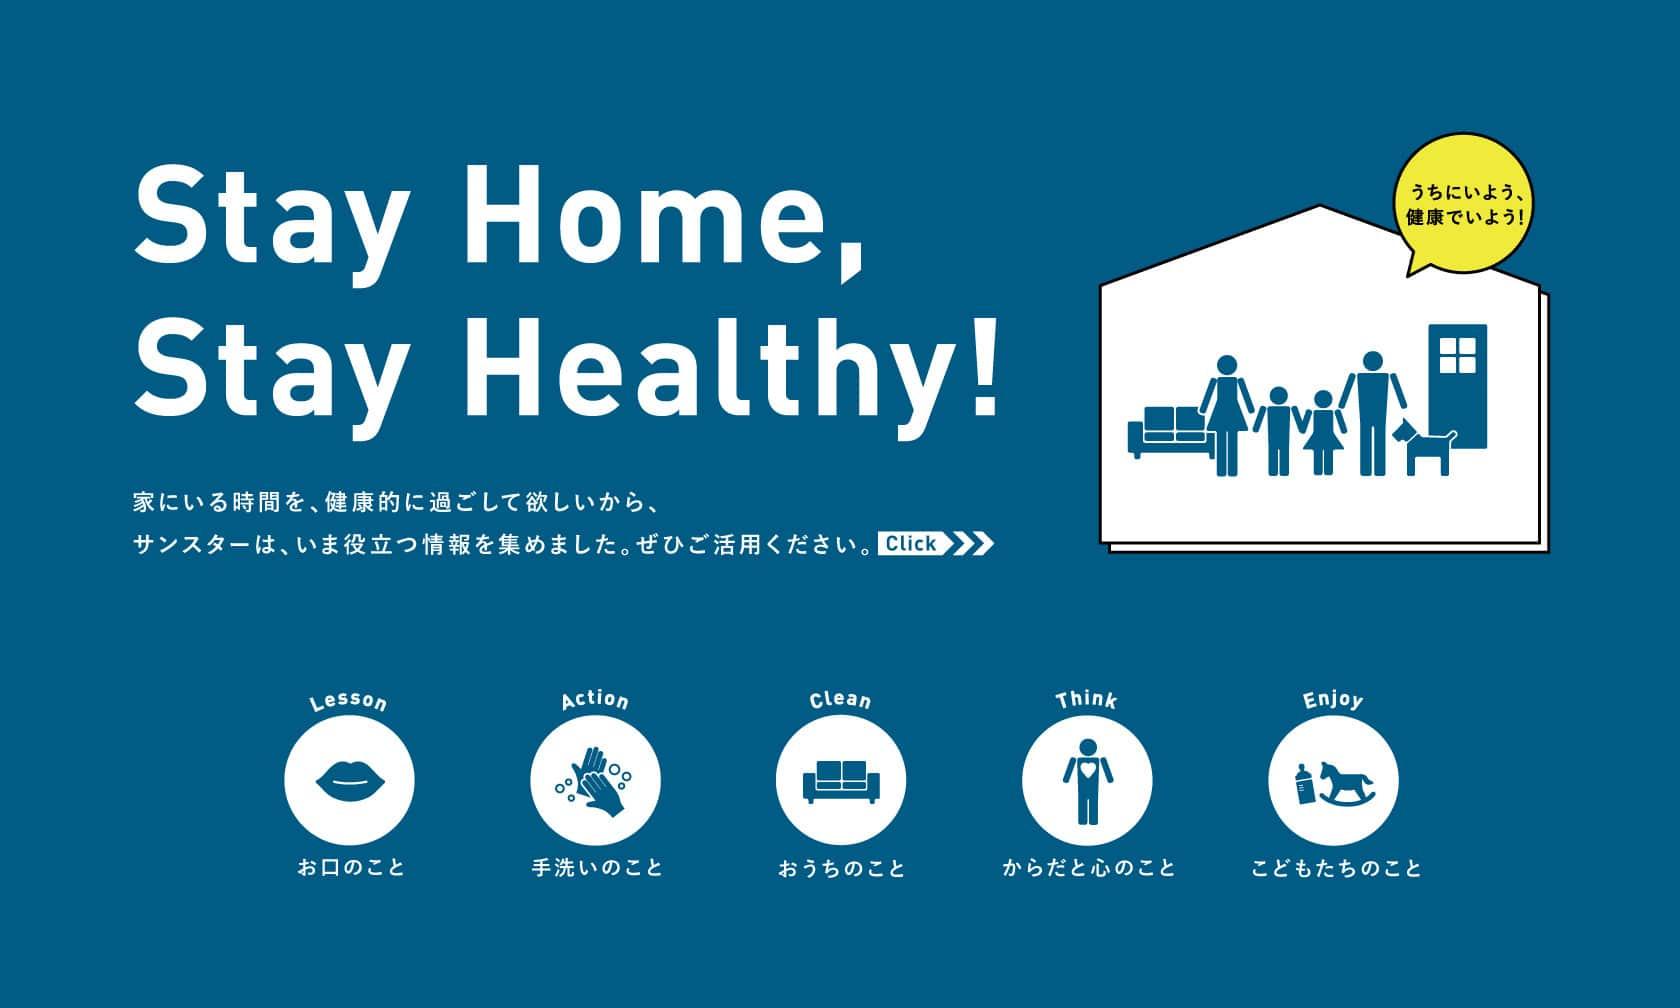 Stay Home, Stay Healthy! サンスター、お家で健康に過ごすためのお役立ち情報を発信